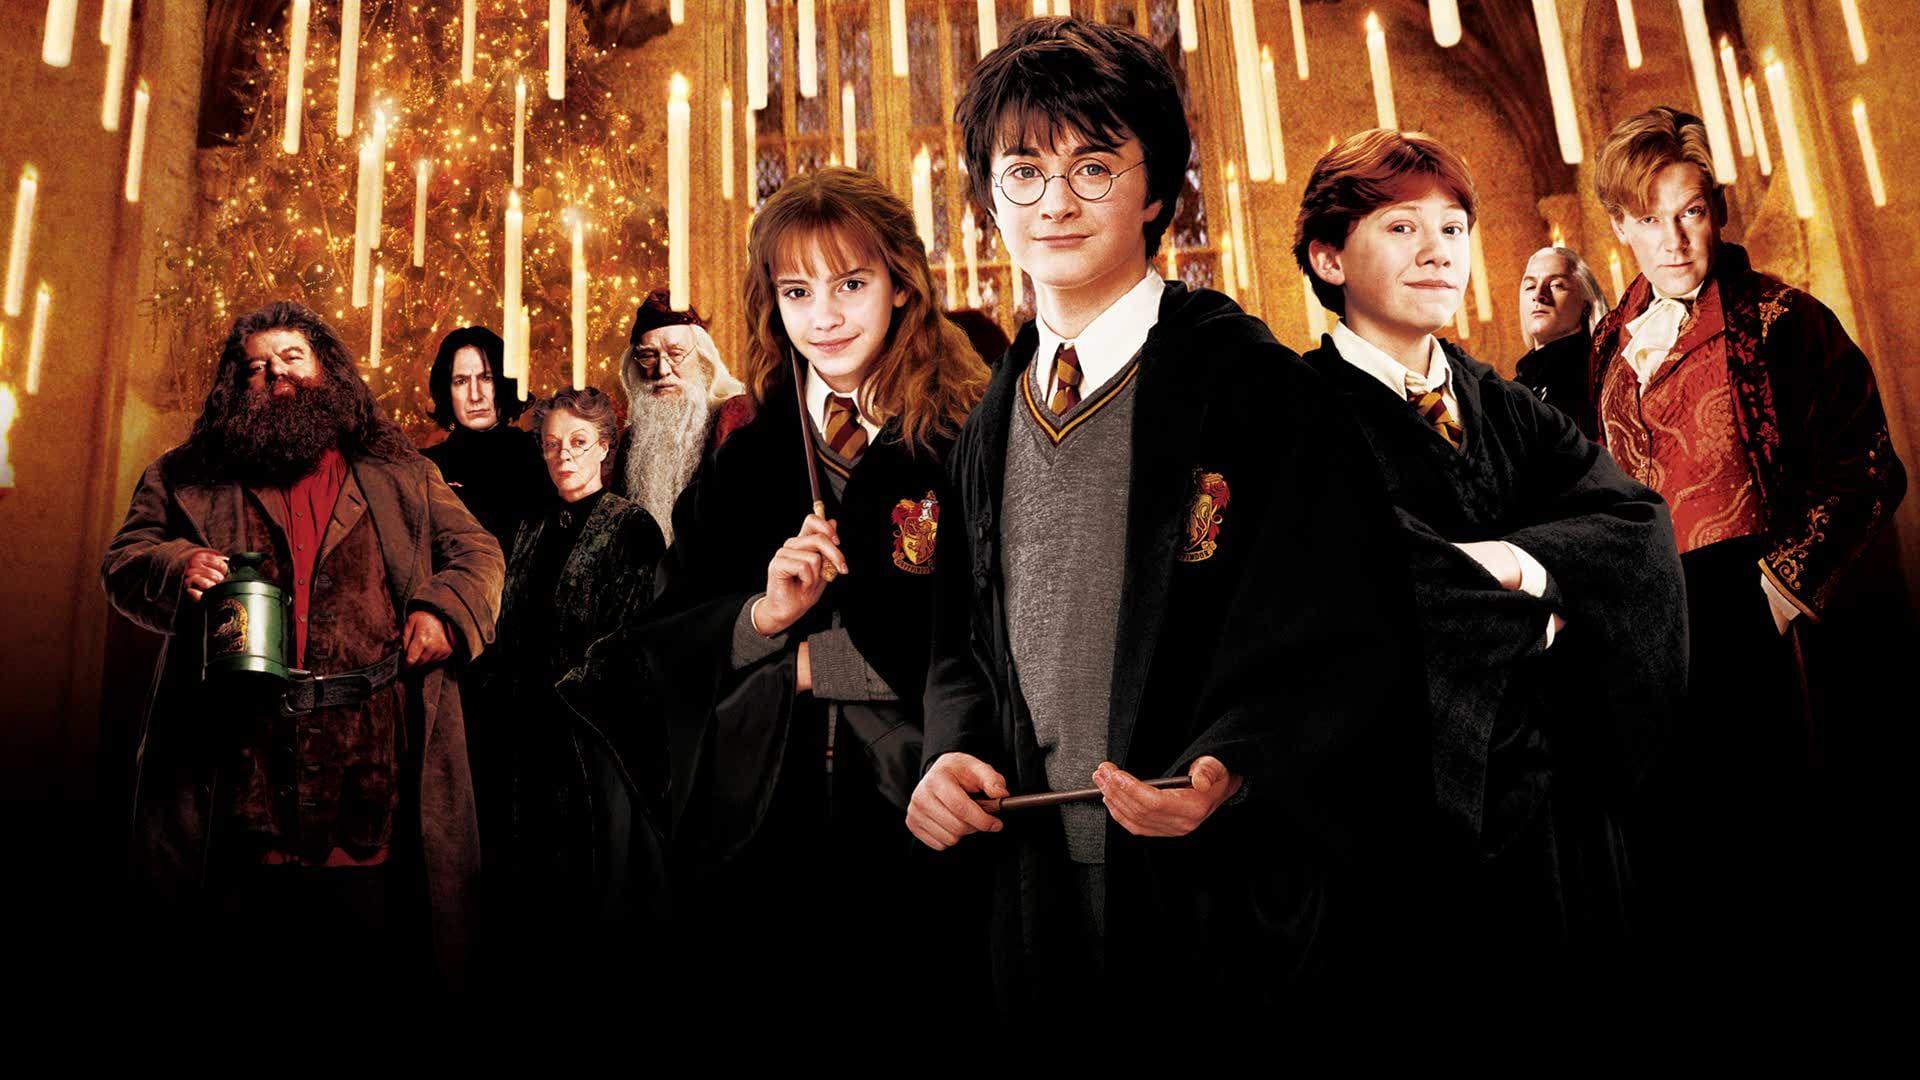 Harry Potter full hd 1080p wallpaper